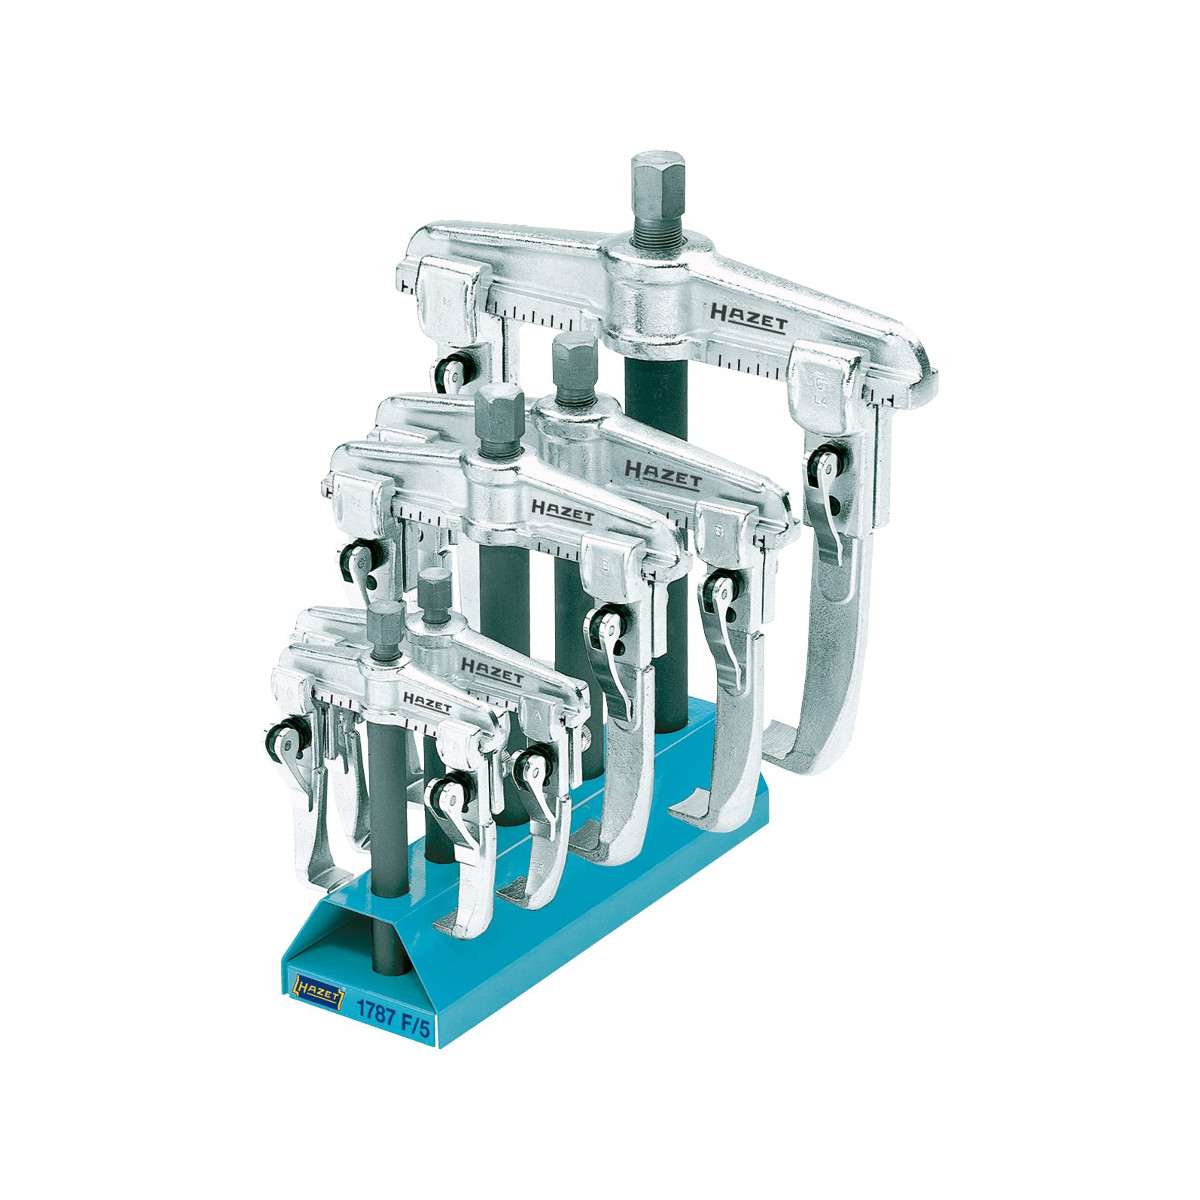 HAZET 1787 F/5 Quick-clamping puller set 2-jaws, 5pcs.